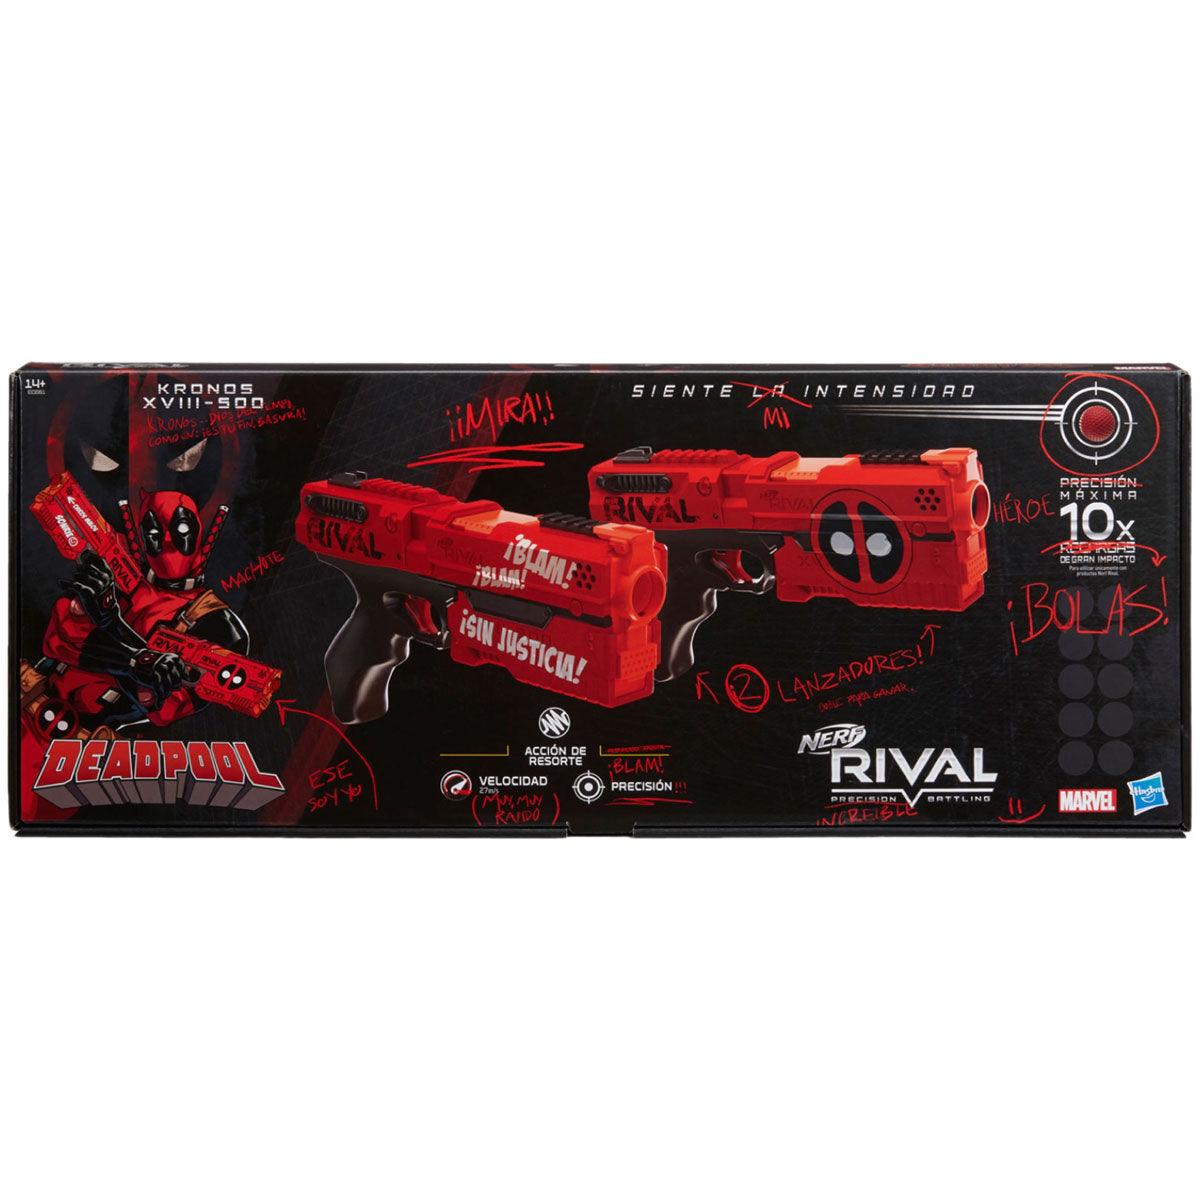 Marvel Deadpool Nerf Rival Kronos XVIII-500 launchers